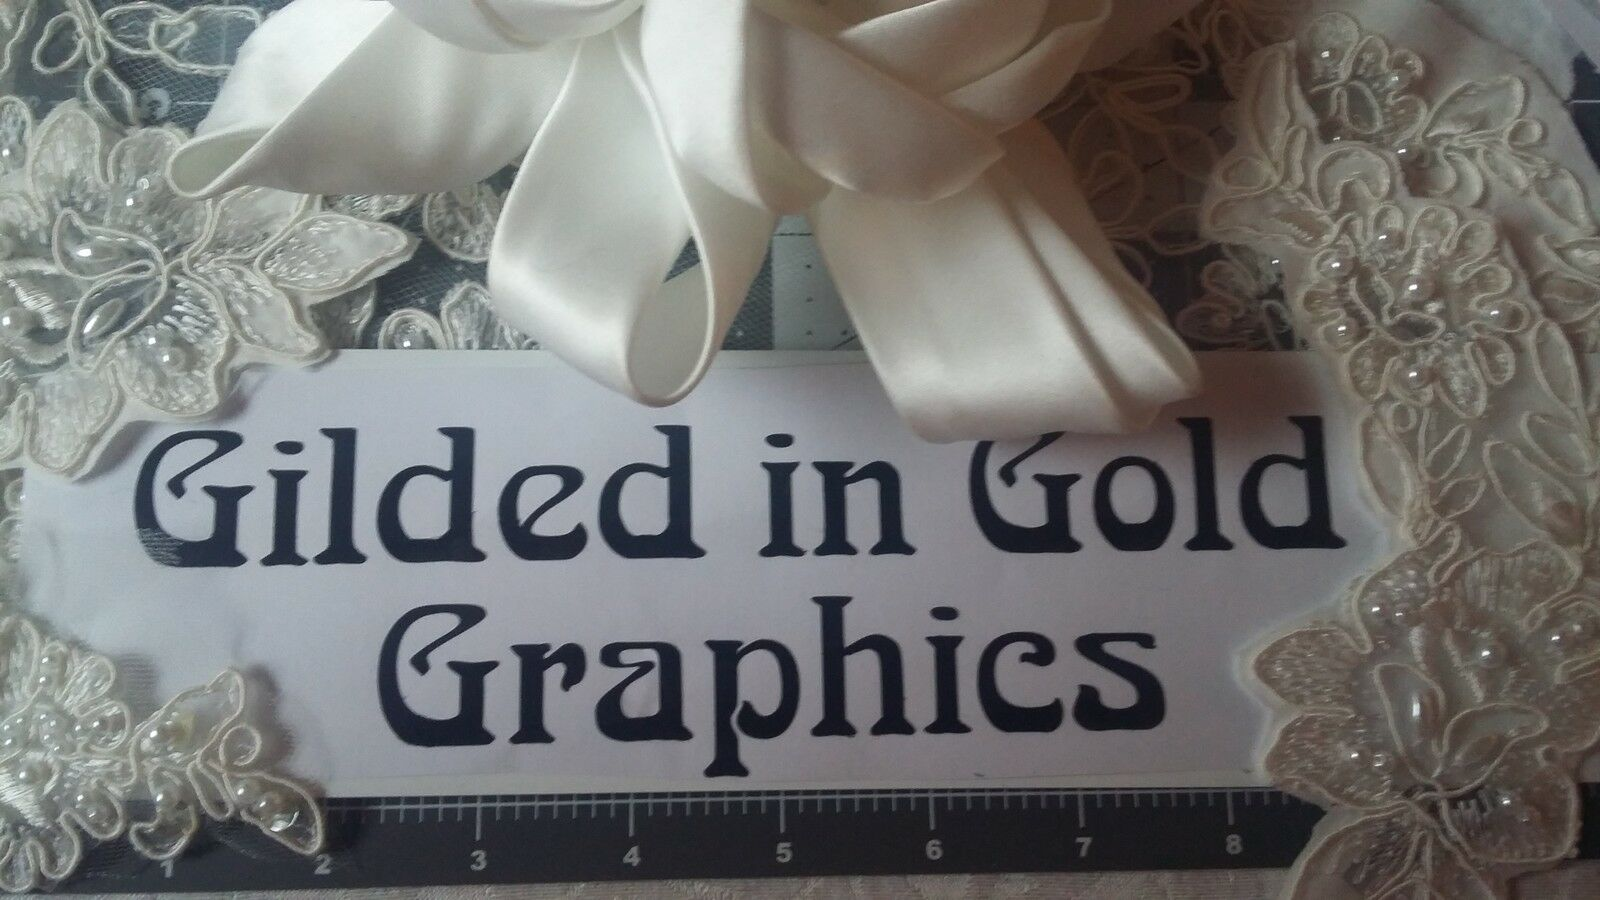 gildedingoldgraphics